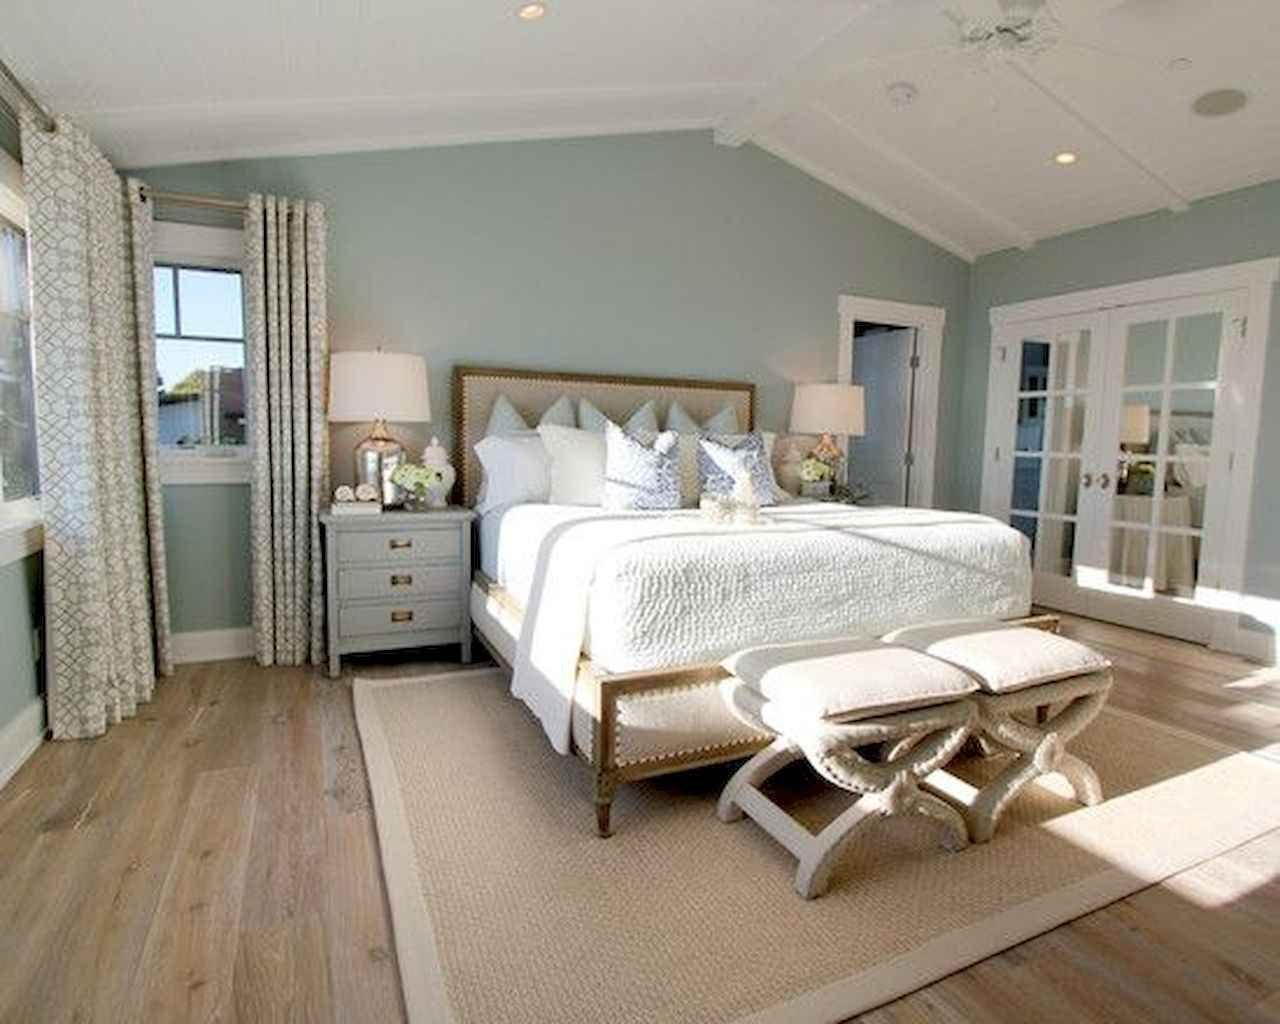 26++ Bedroom ideas for light blue walls info cpns terbaru